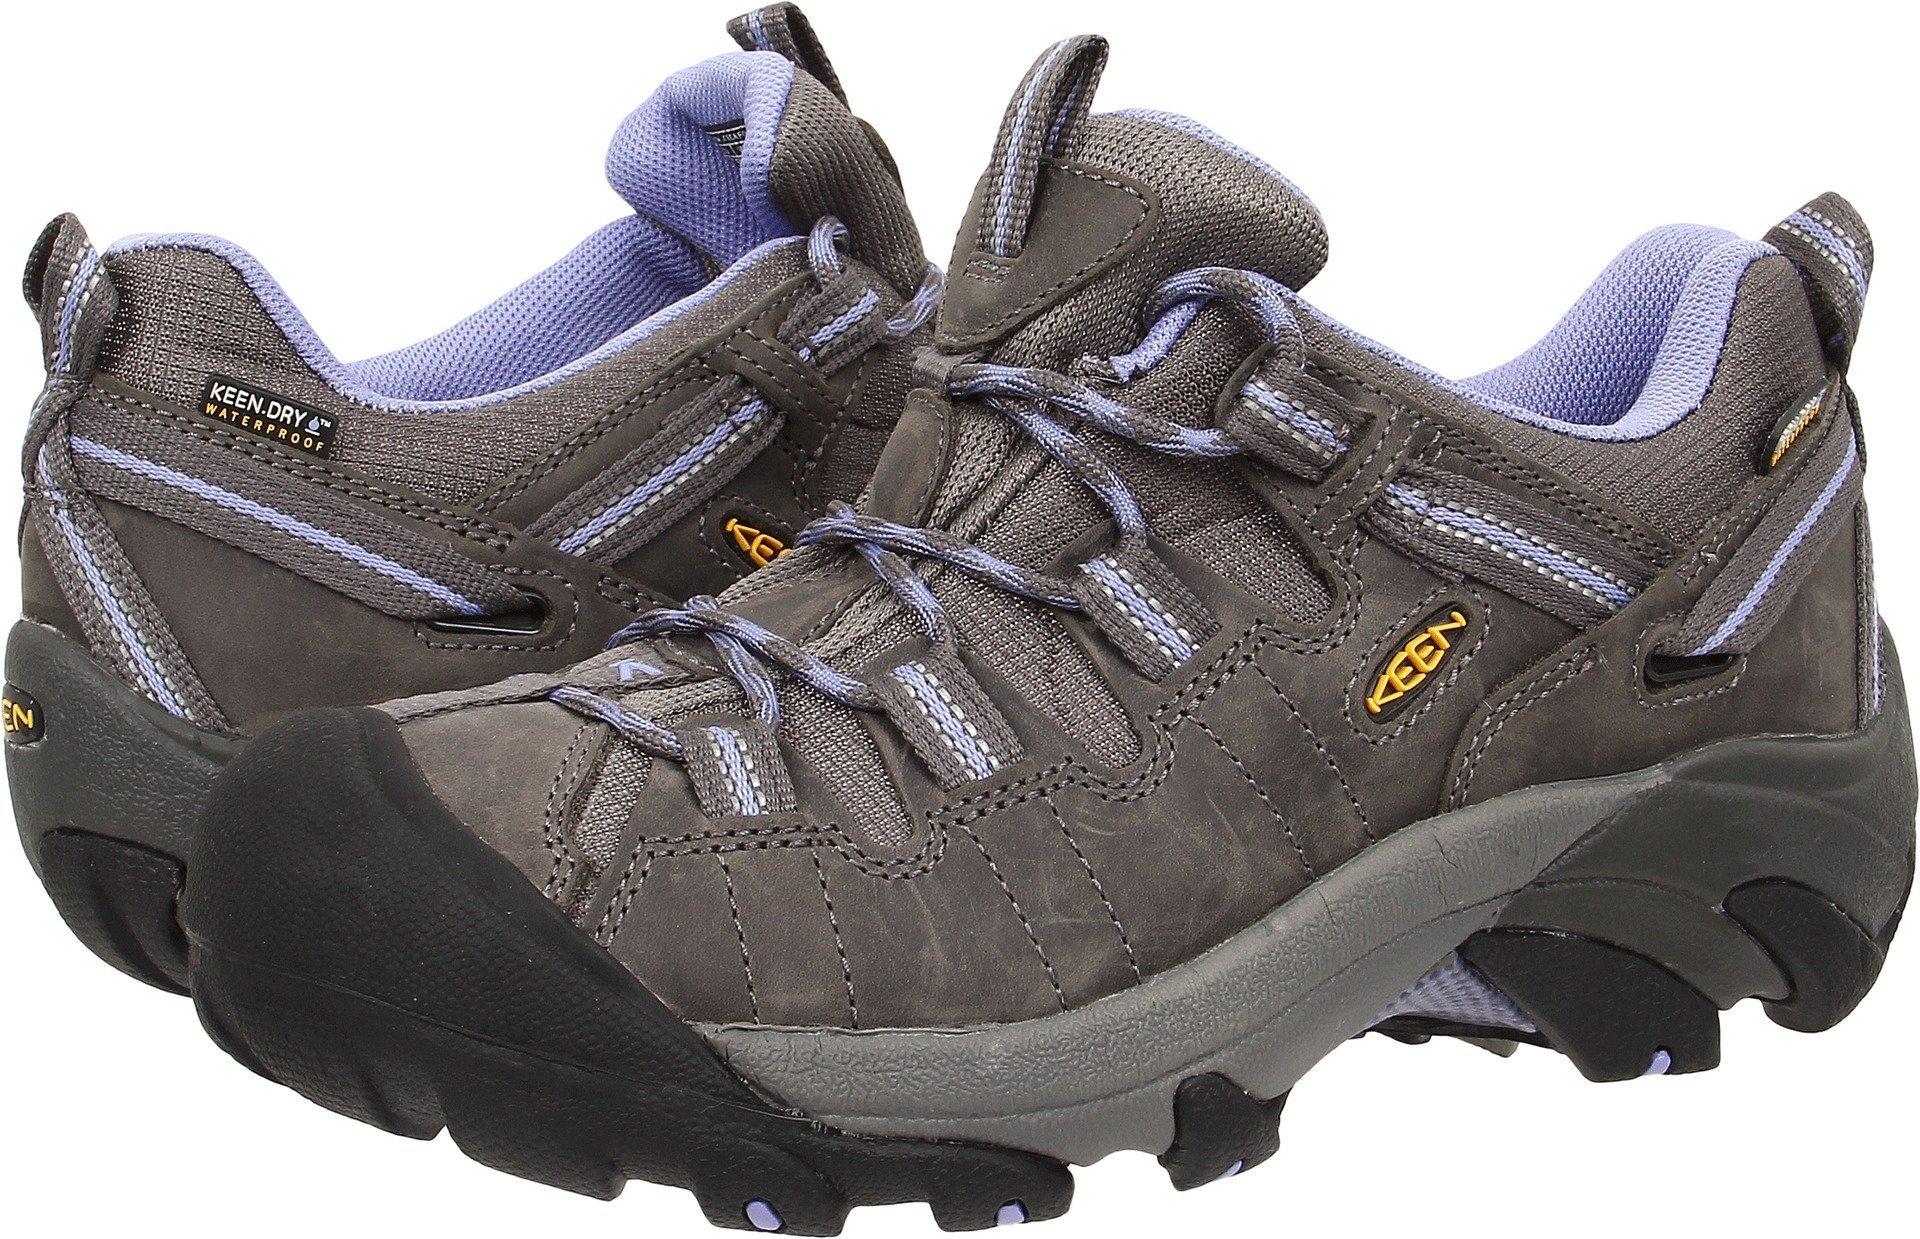 KEEN Women's Targhee II Outdoor Shoe, Magnet/Periwinkle, 6.5 M US